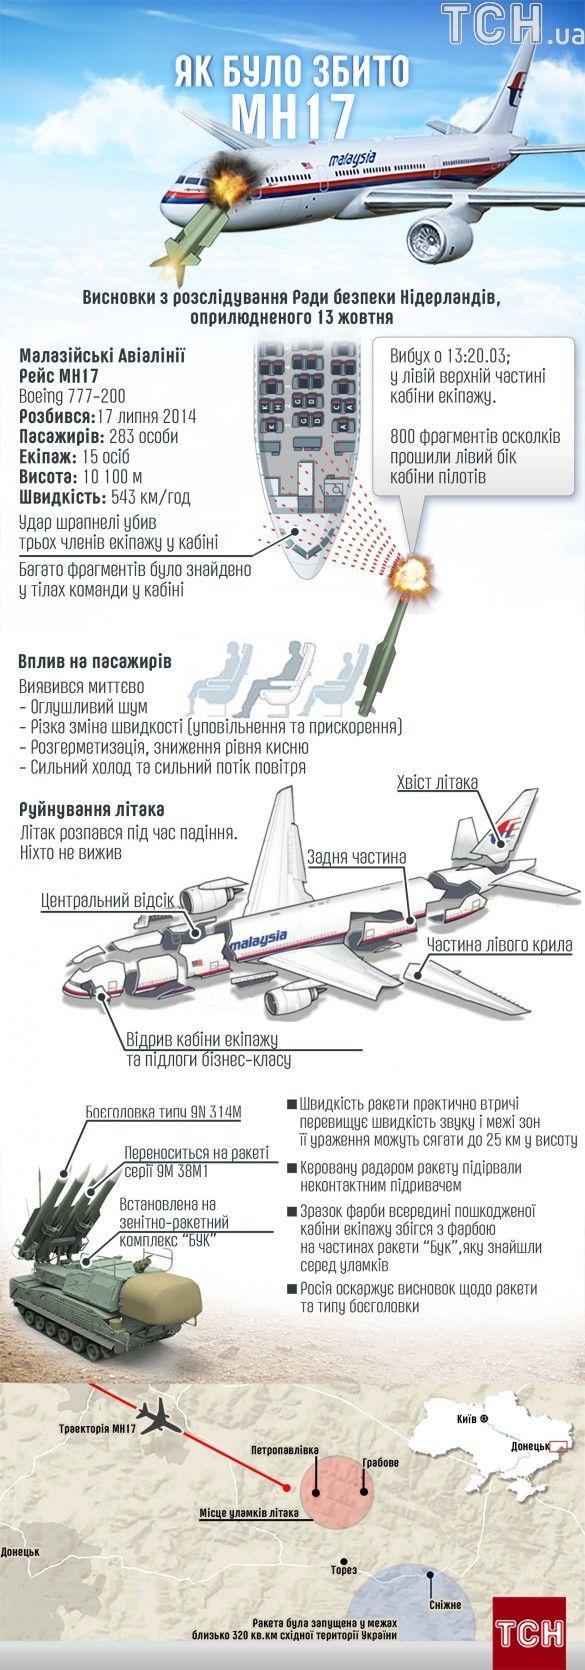 Катастрофа MH17. Інфографіка